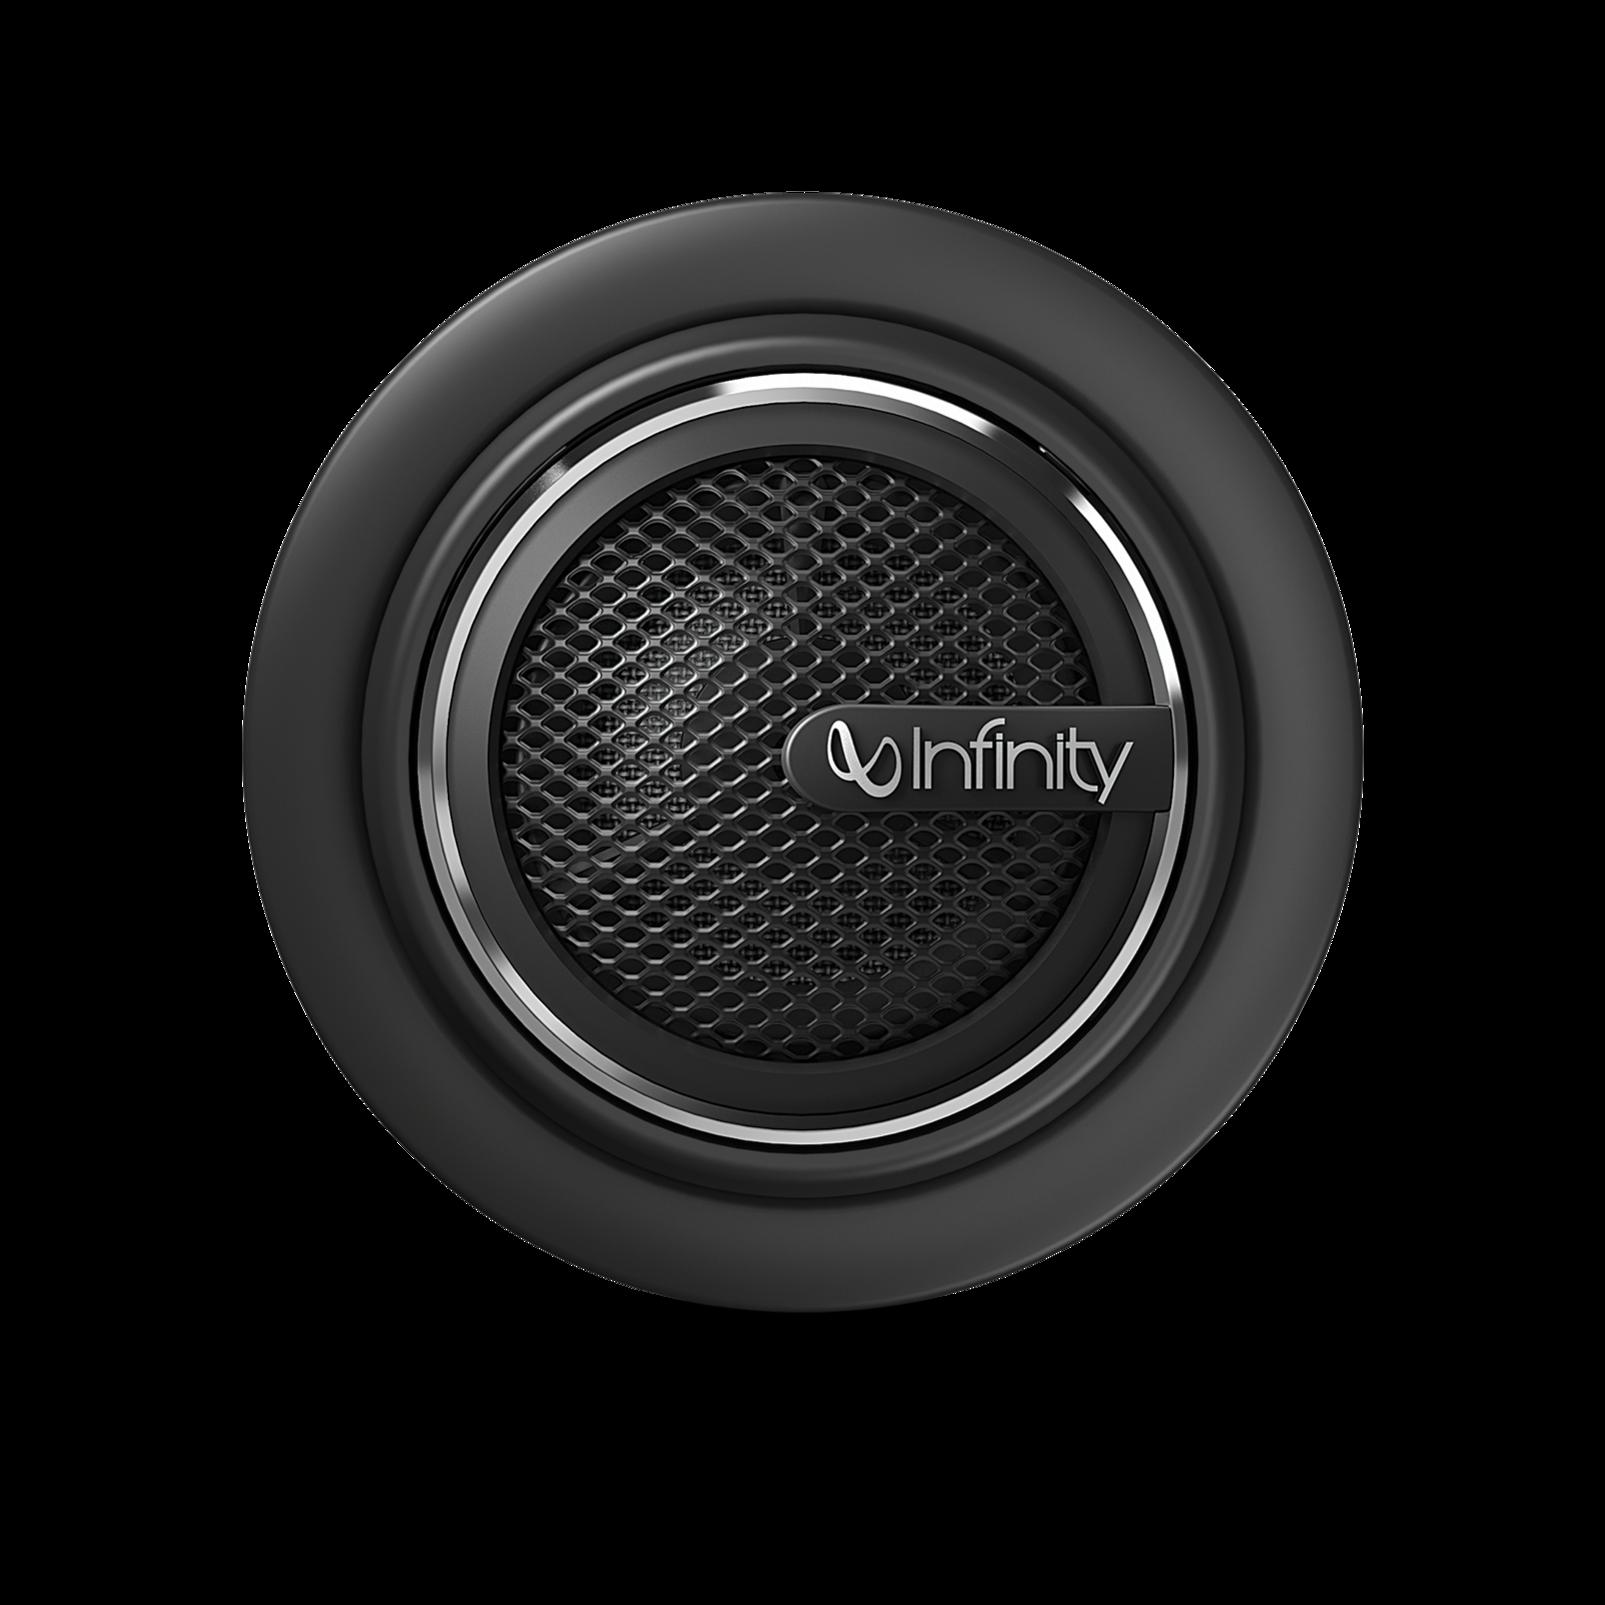 "Kappa 60.11cs - Black - 6-1/2"", two-way, component speaker system - Back"